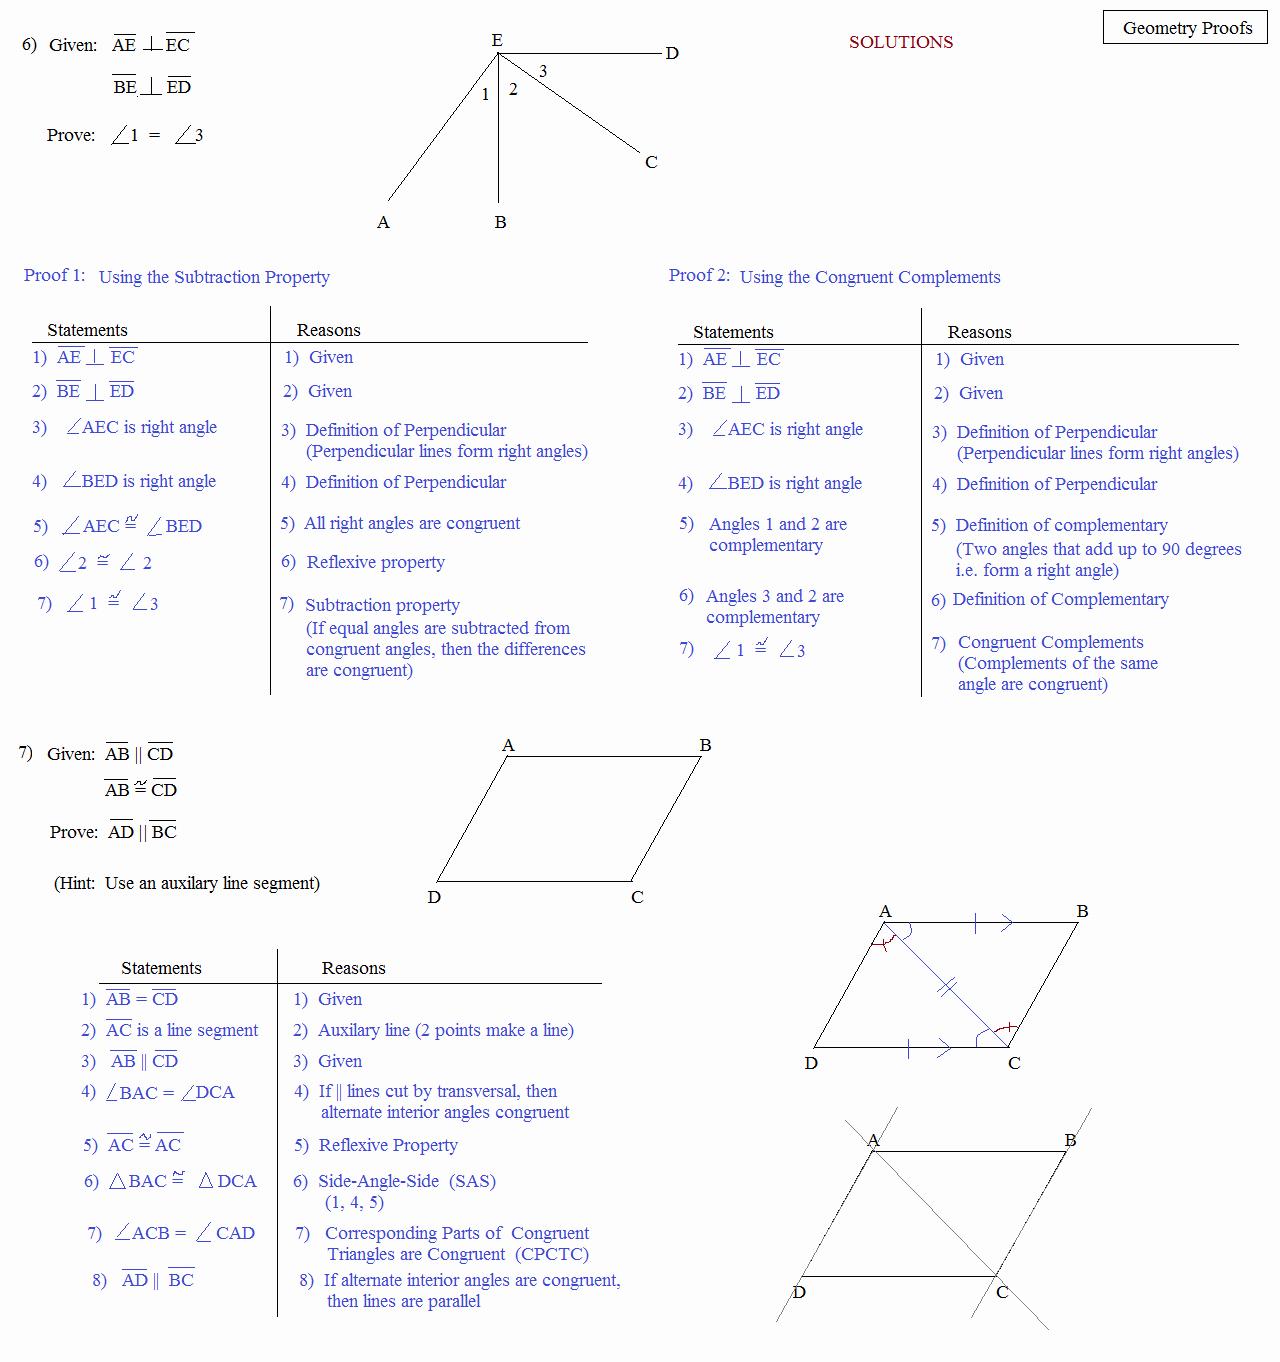 Geometry Worksheet Beginning Proofs Luxury Math Plane Proofs & Postulates 1 Worksheet